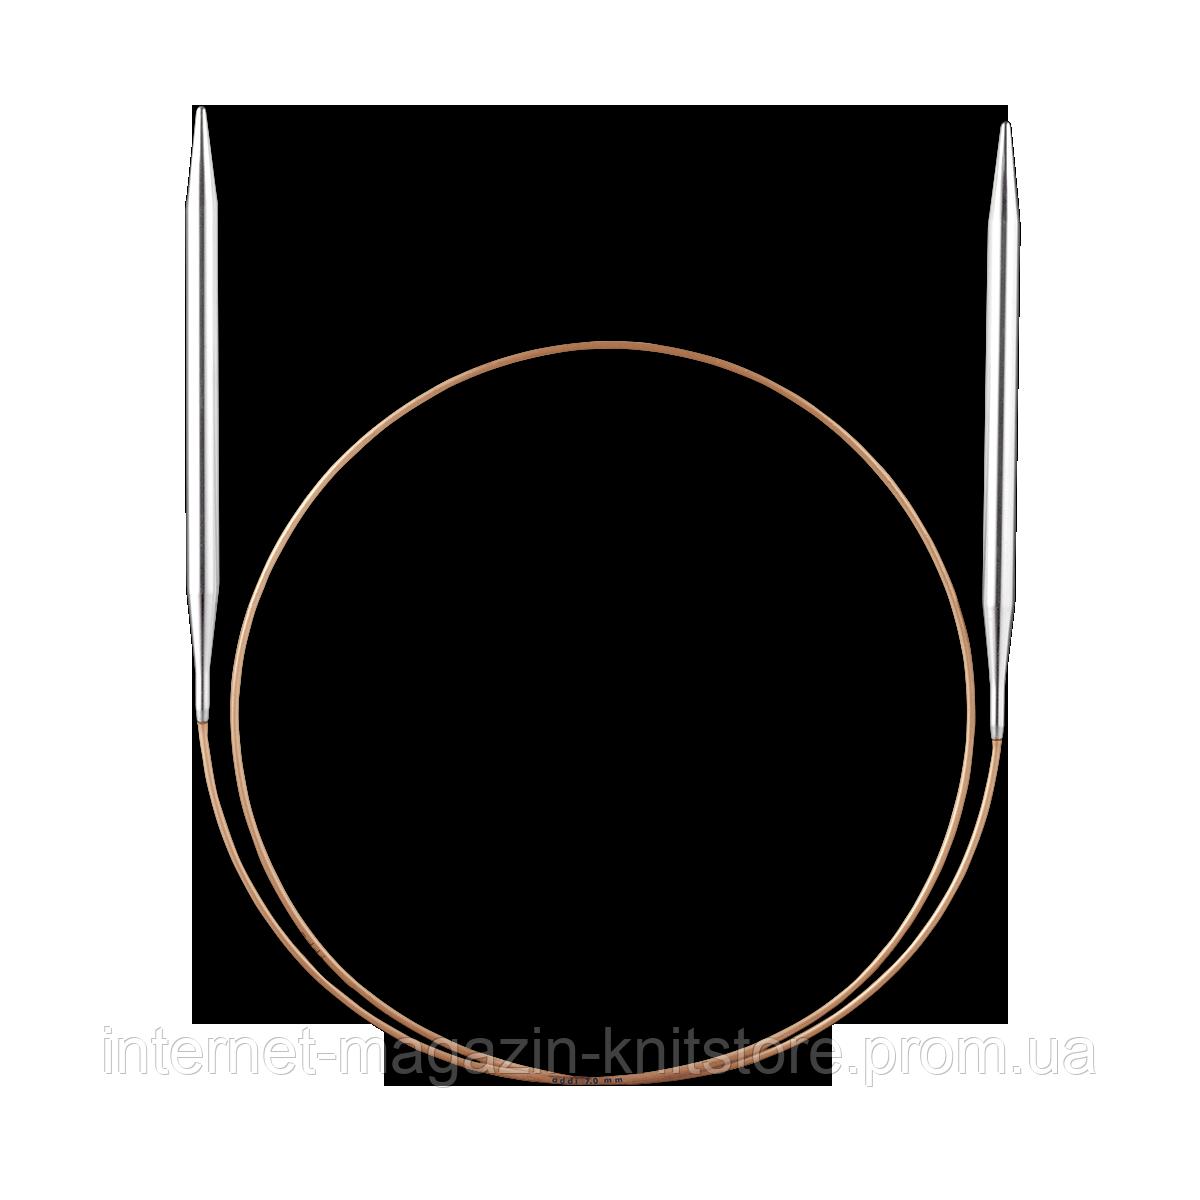 Спицы Addi 60 см/4.5 мм круговые